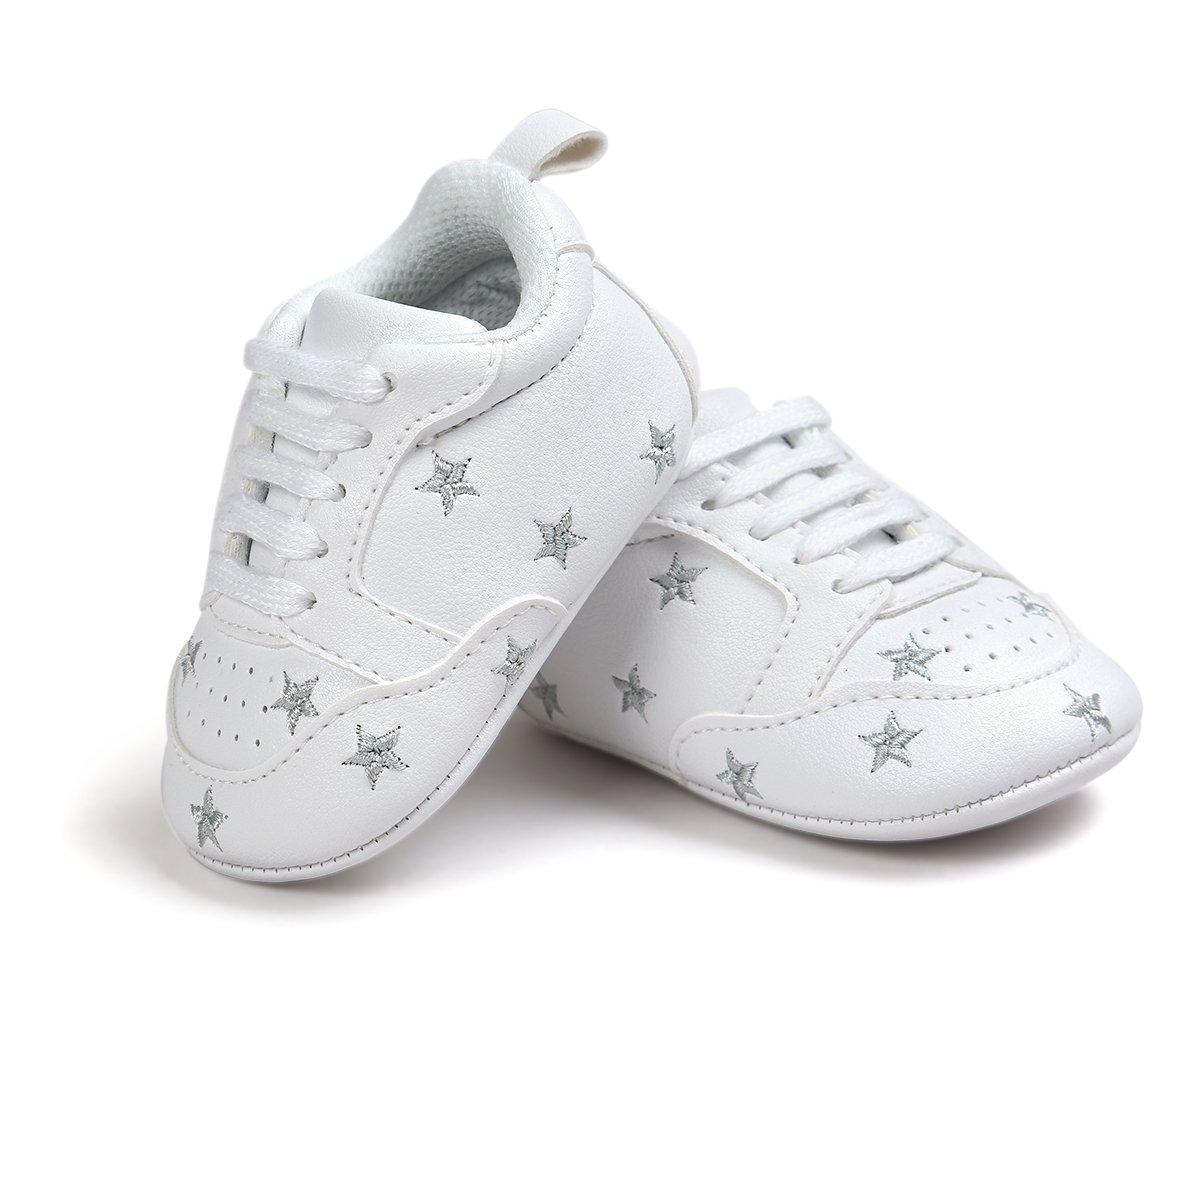 Itaar Scarpe Bambino in Morbida Pelle Scarpe Primi Passi (11 (0-6 mesi), stelle d'argento)